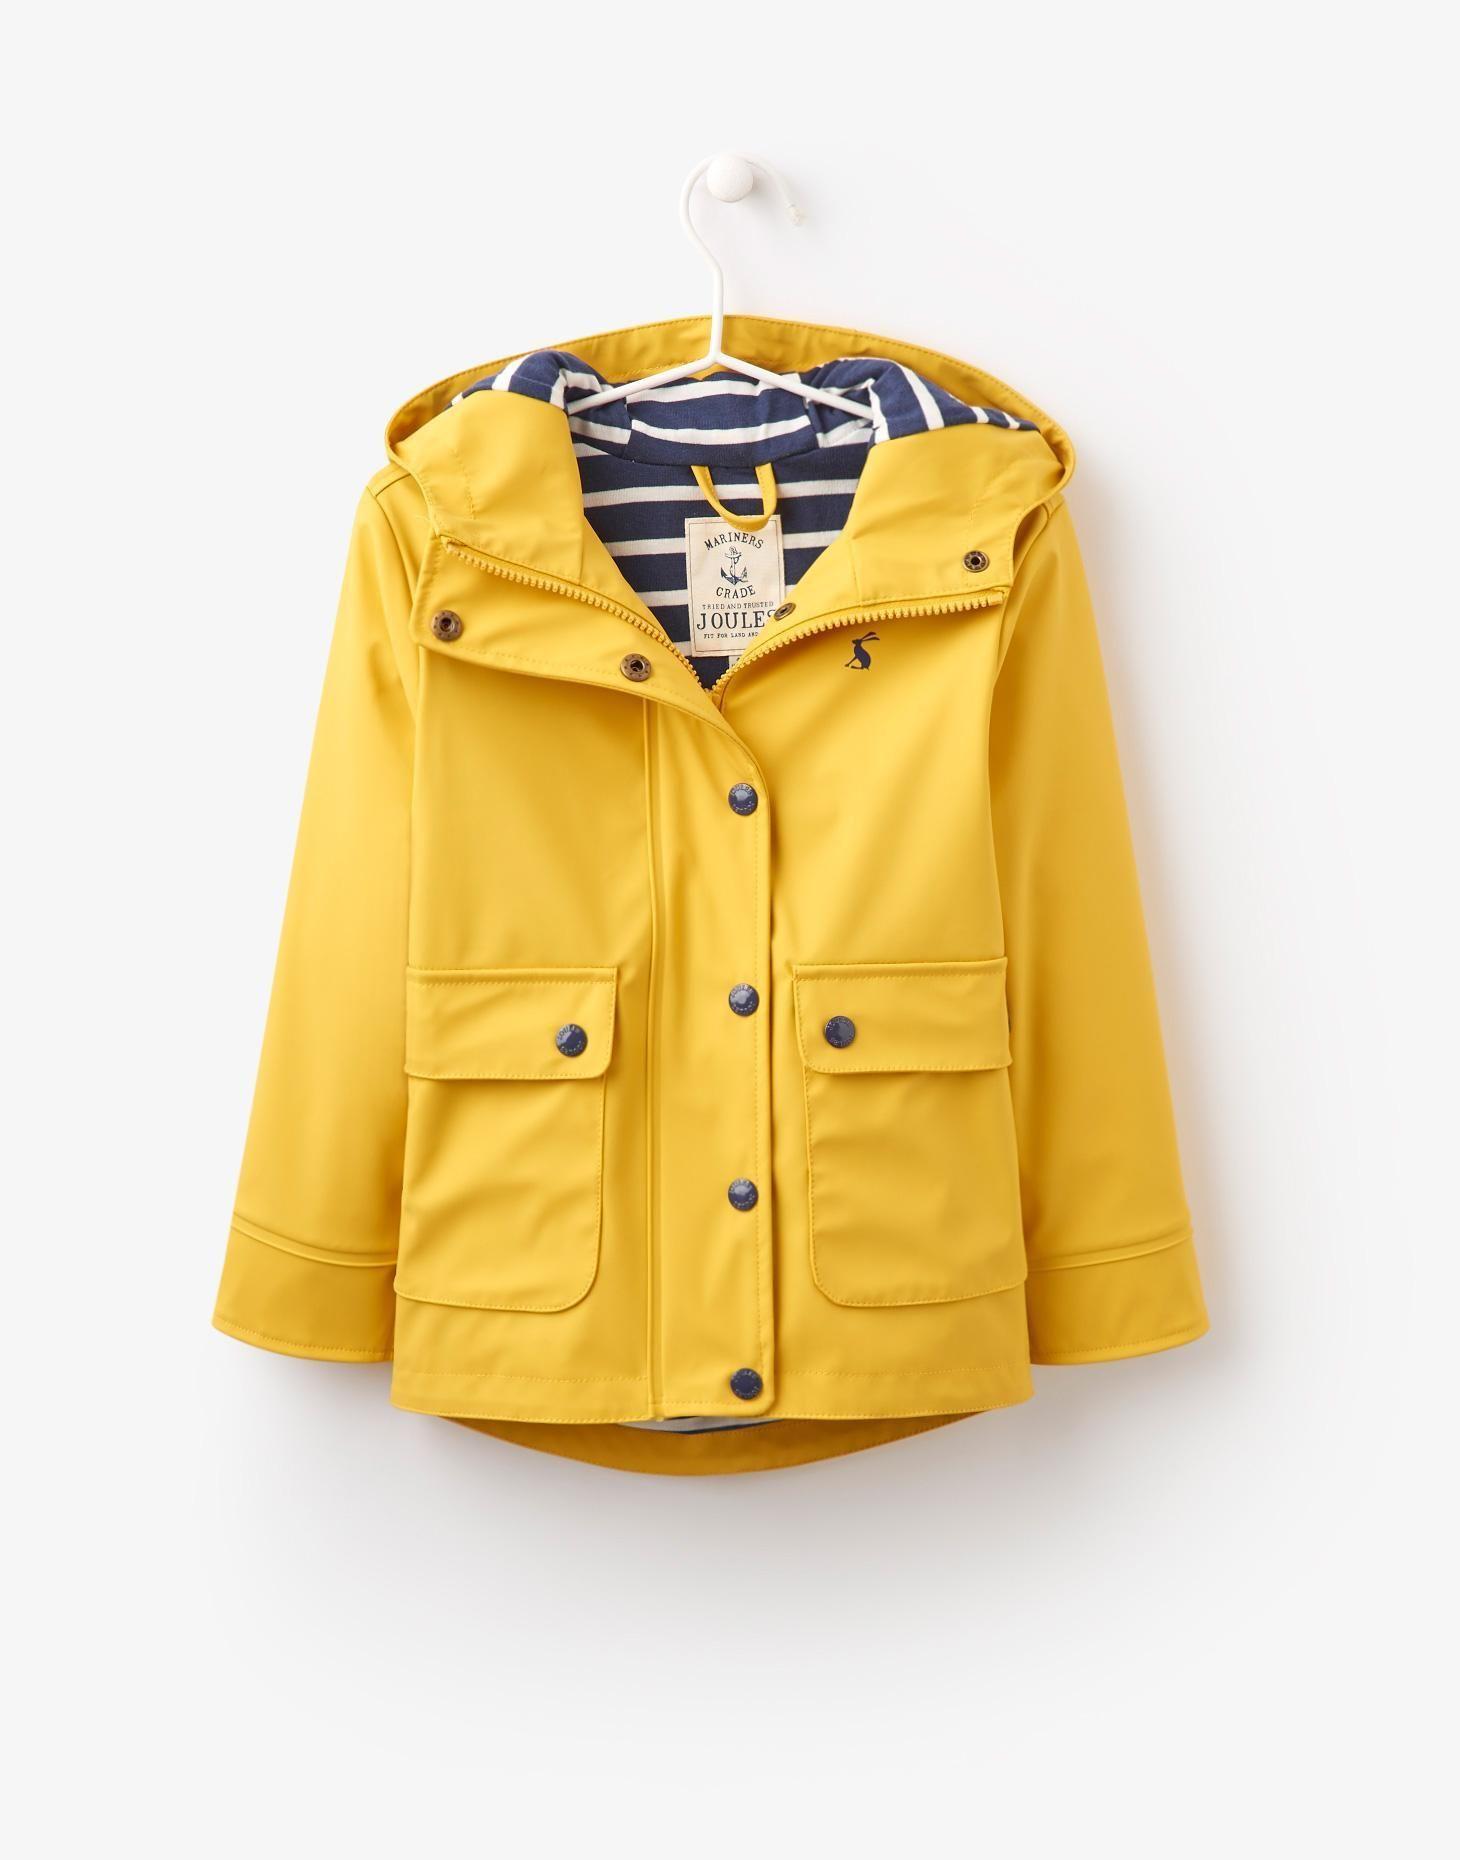 6d26c9089 123947 Yellow Girls Waterproof Rubber Coat   Joules UK   Dressing ...